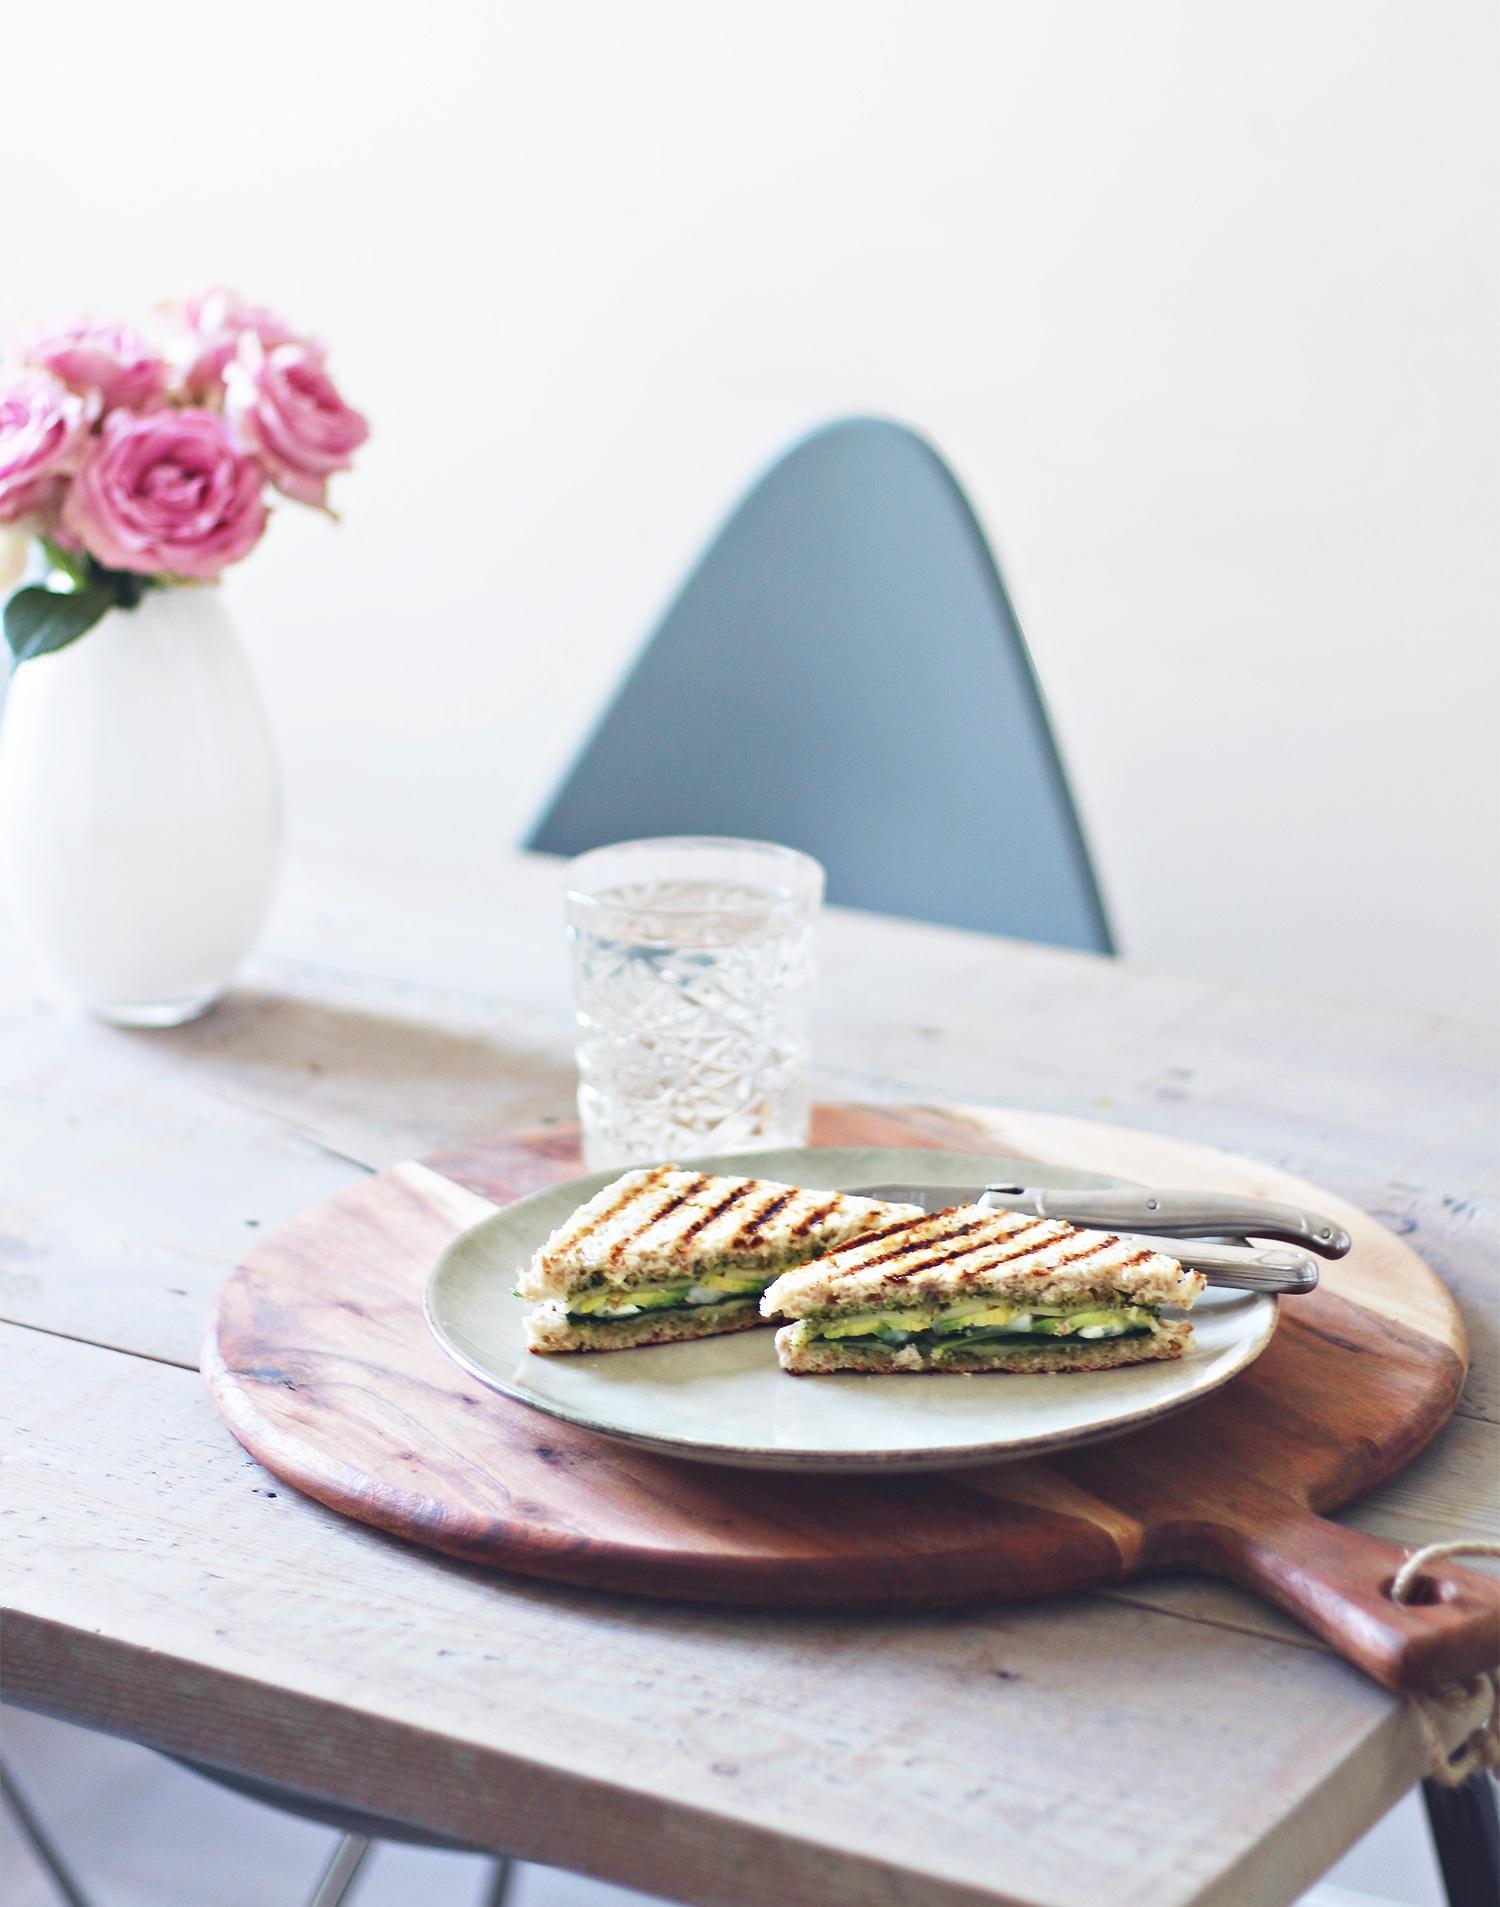 avocado-gedeost-sandwish@2x